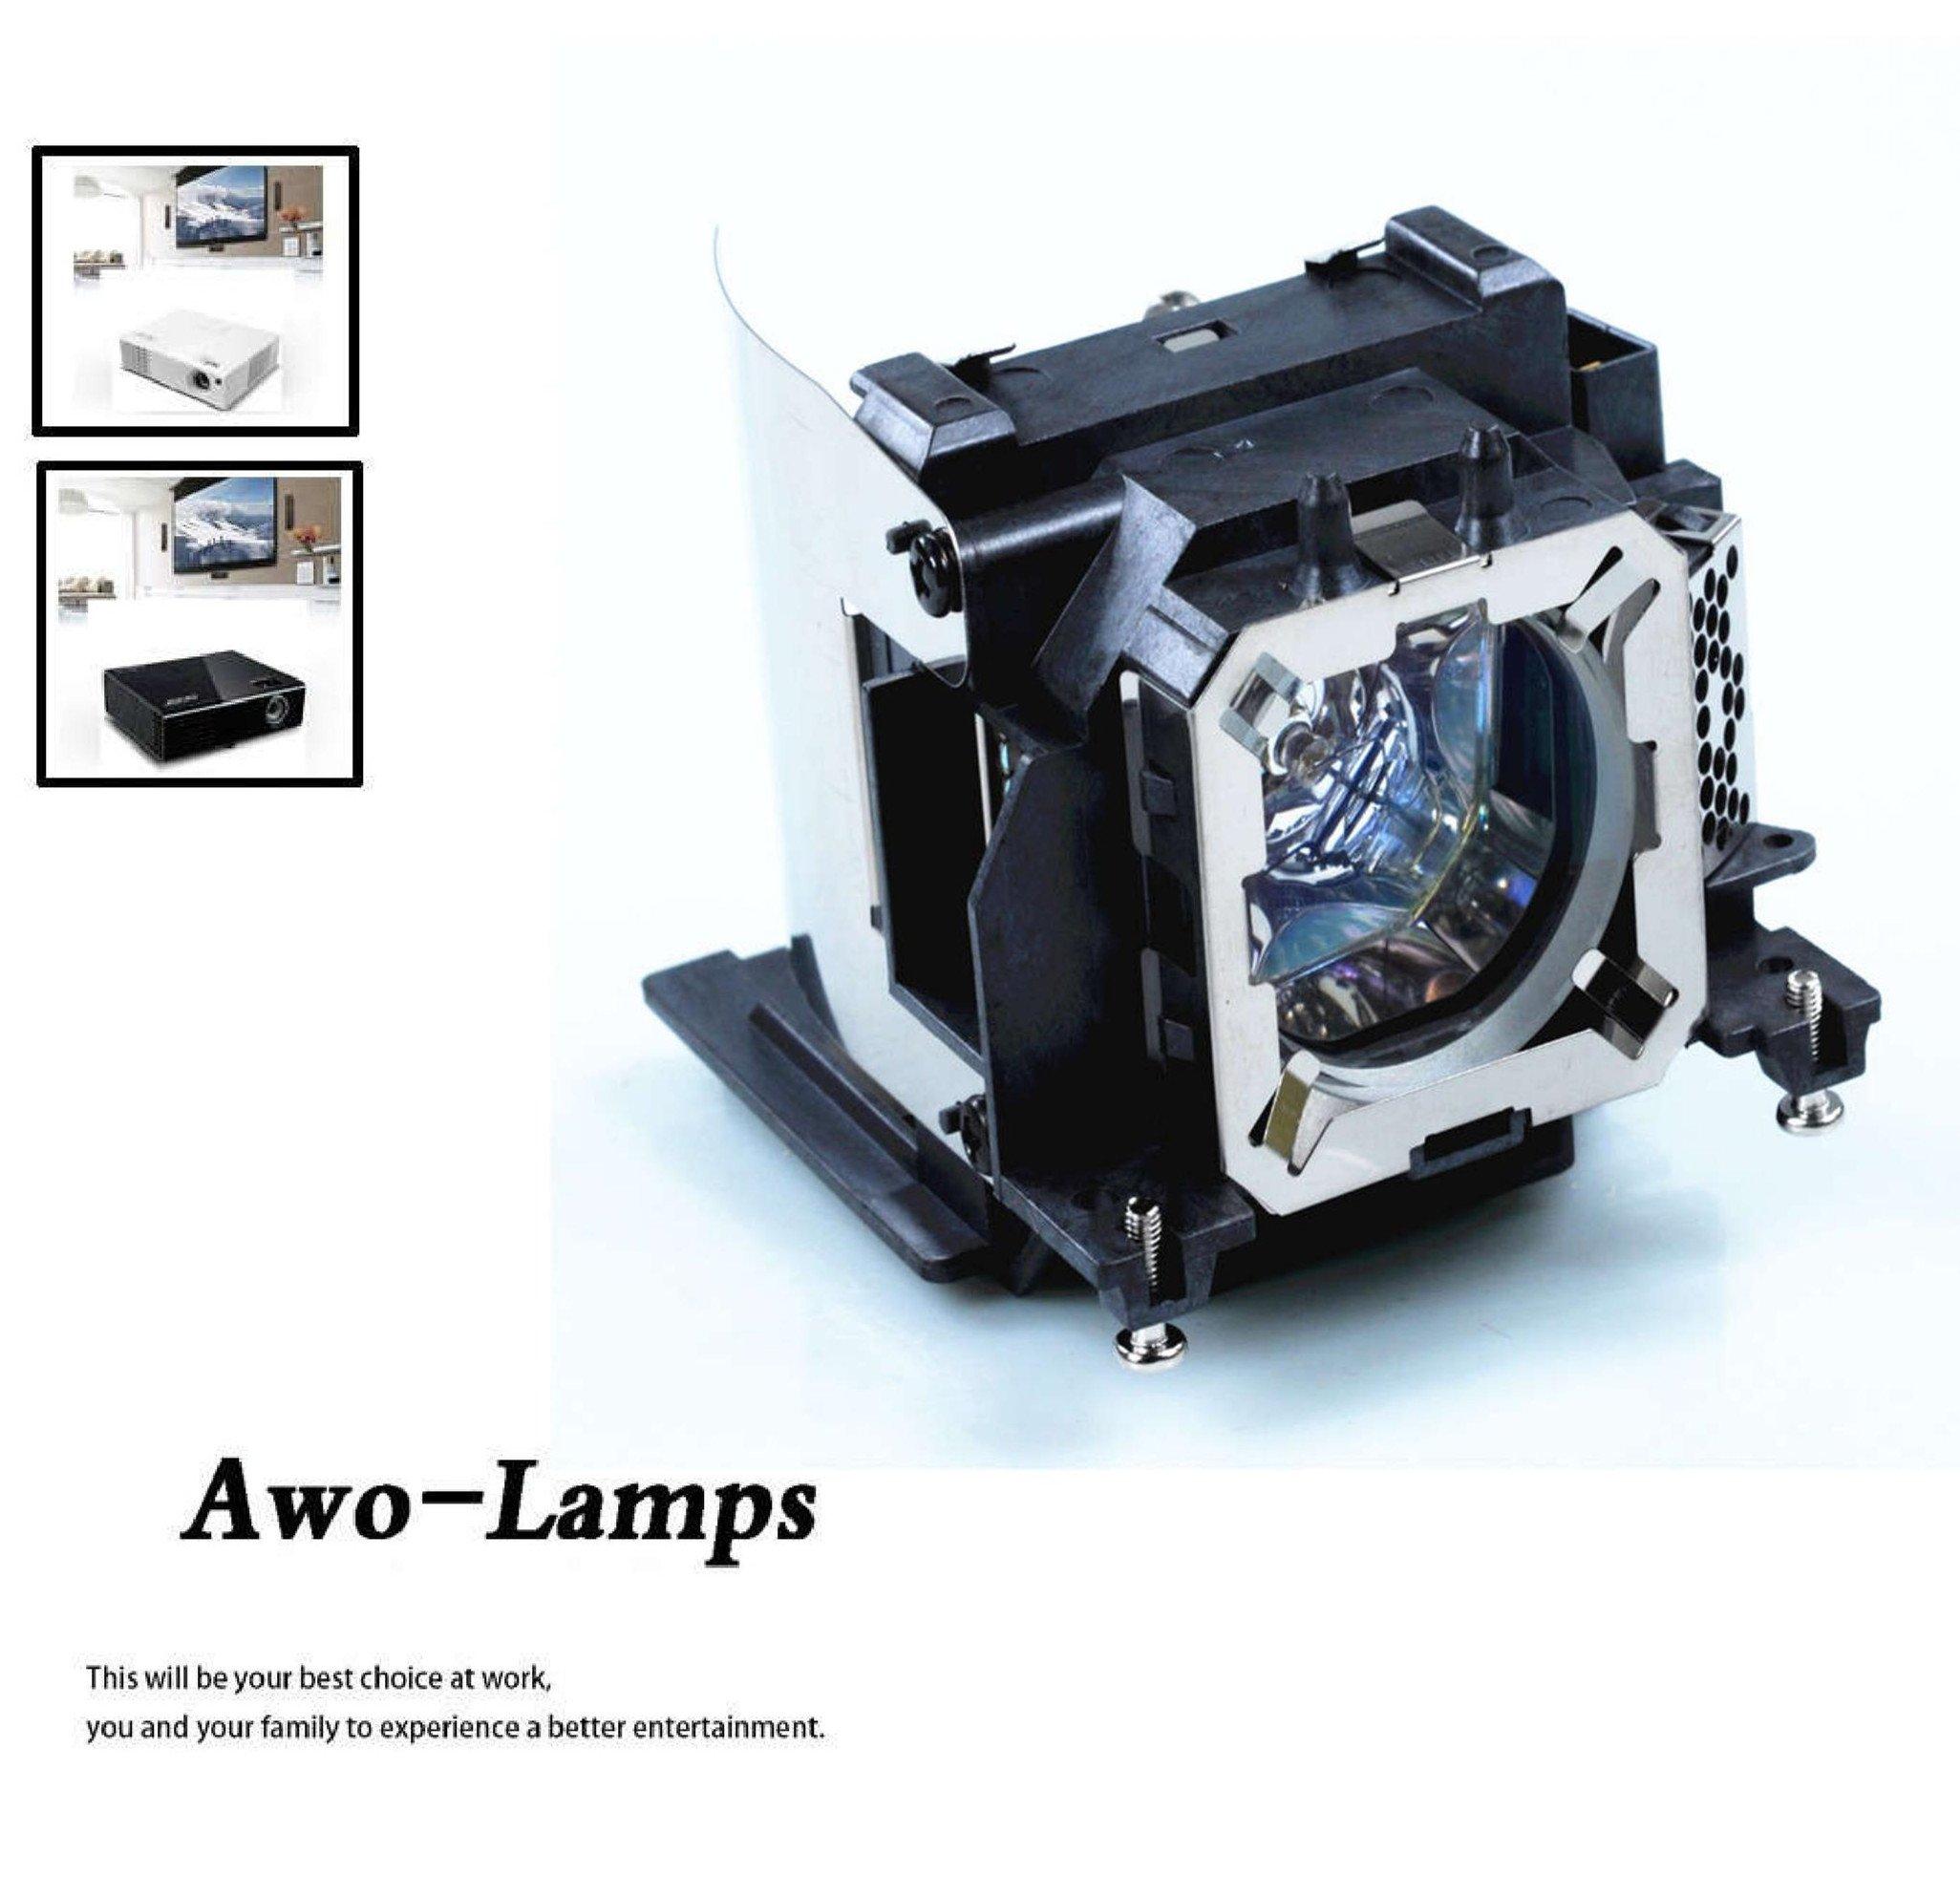 AWO Original Projector Lamp Bulb ET-LAV300 with Housing Fit for PANASONIC PT-VW345NZ, PT-VW340Z, PT-VX415NZ, PT-VX410Z, PT-VX42Z